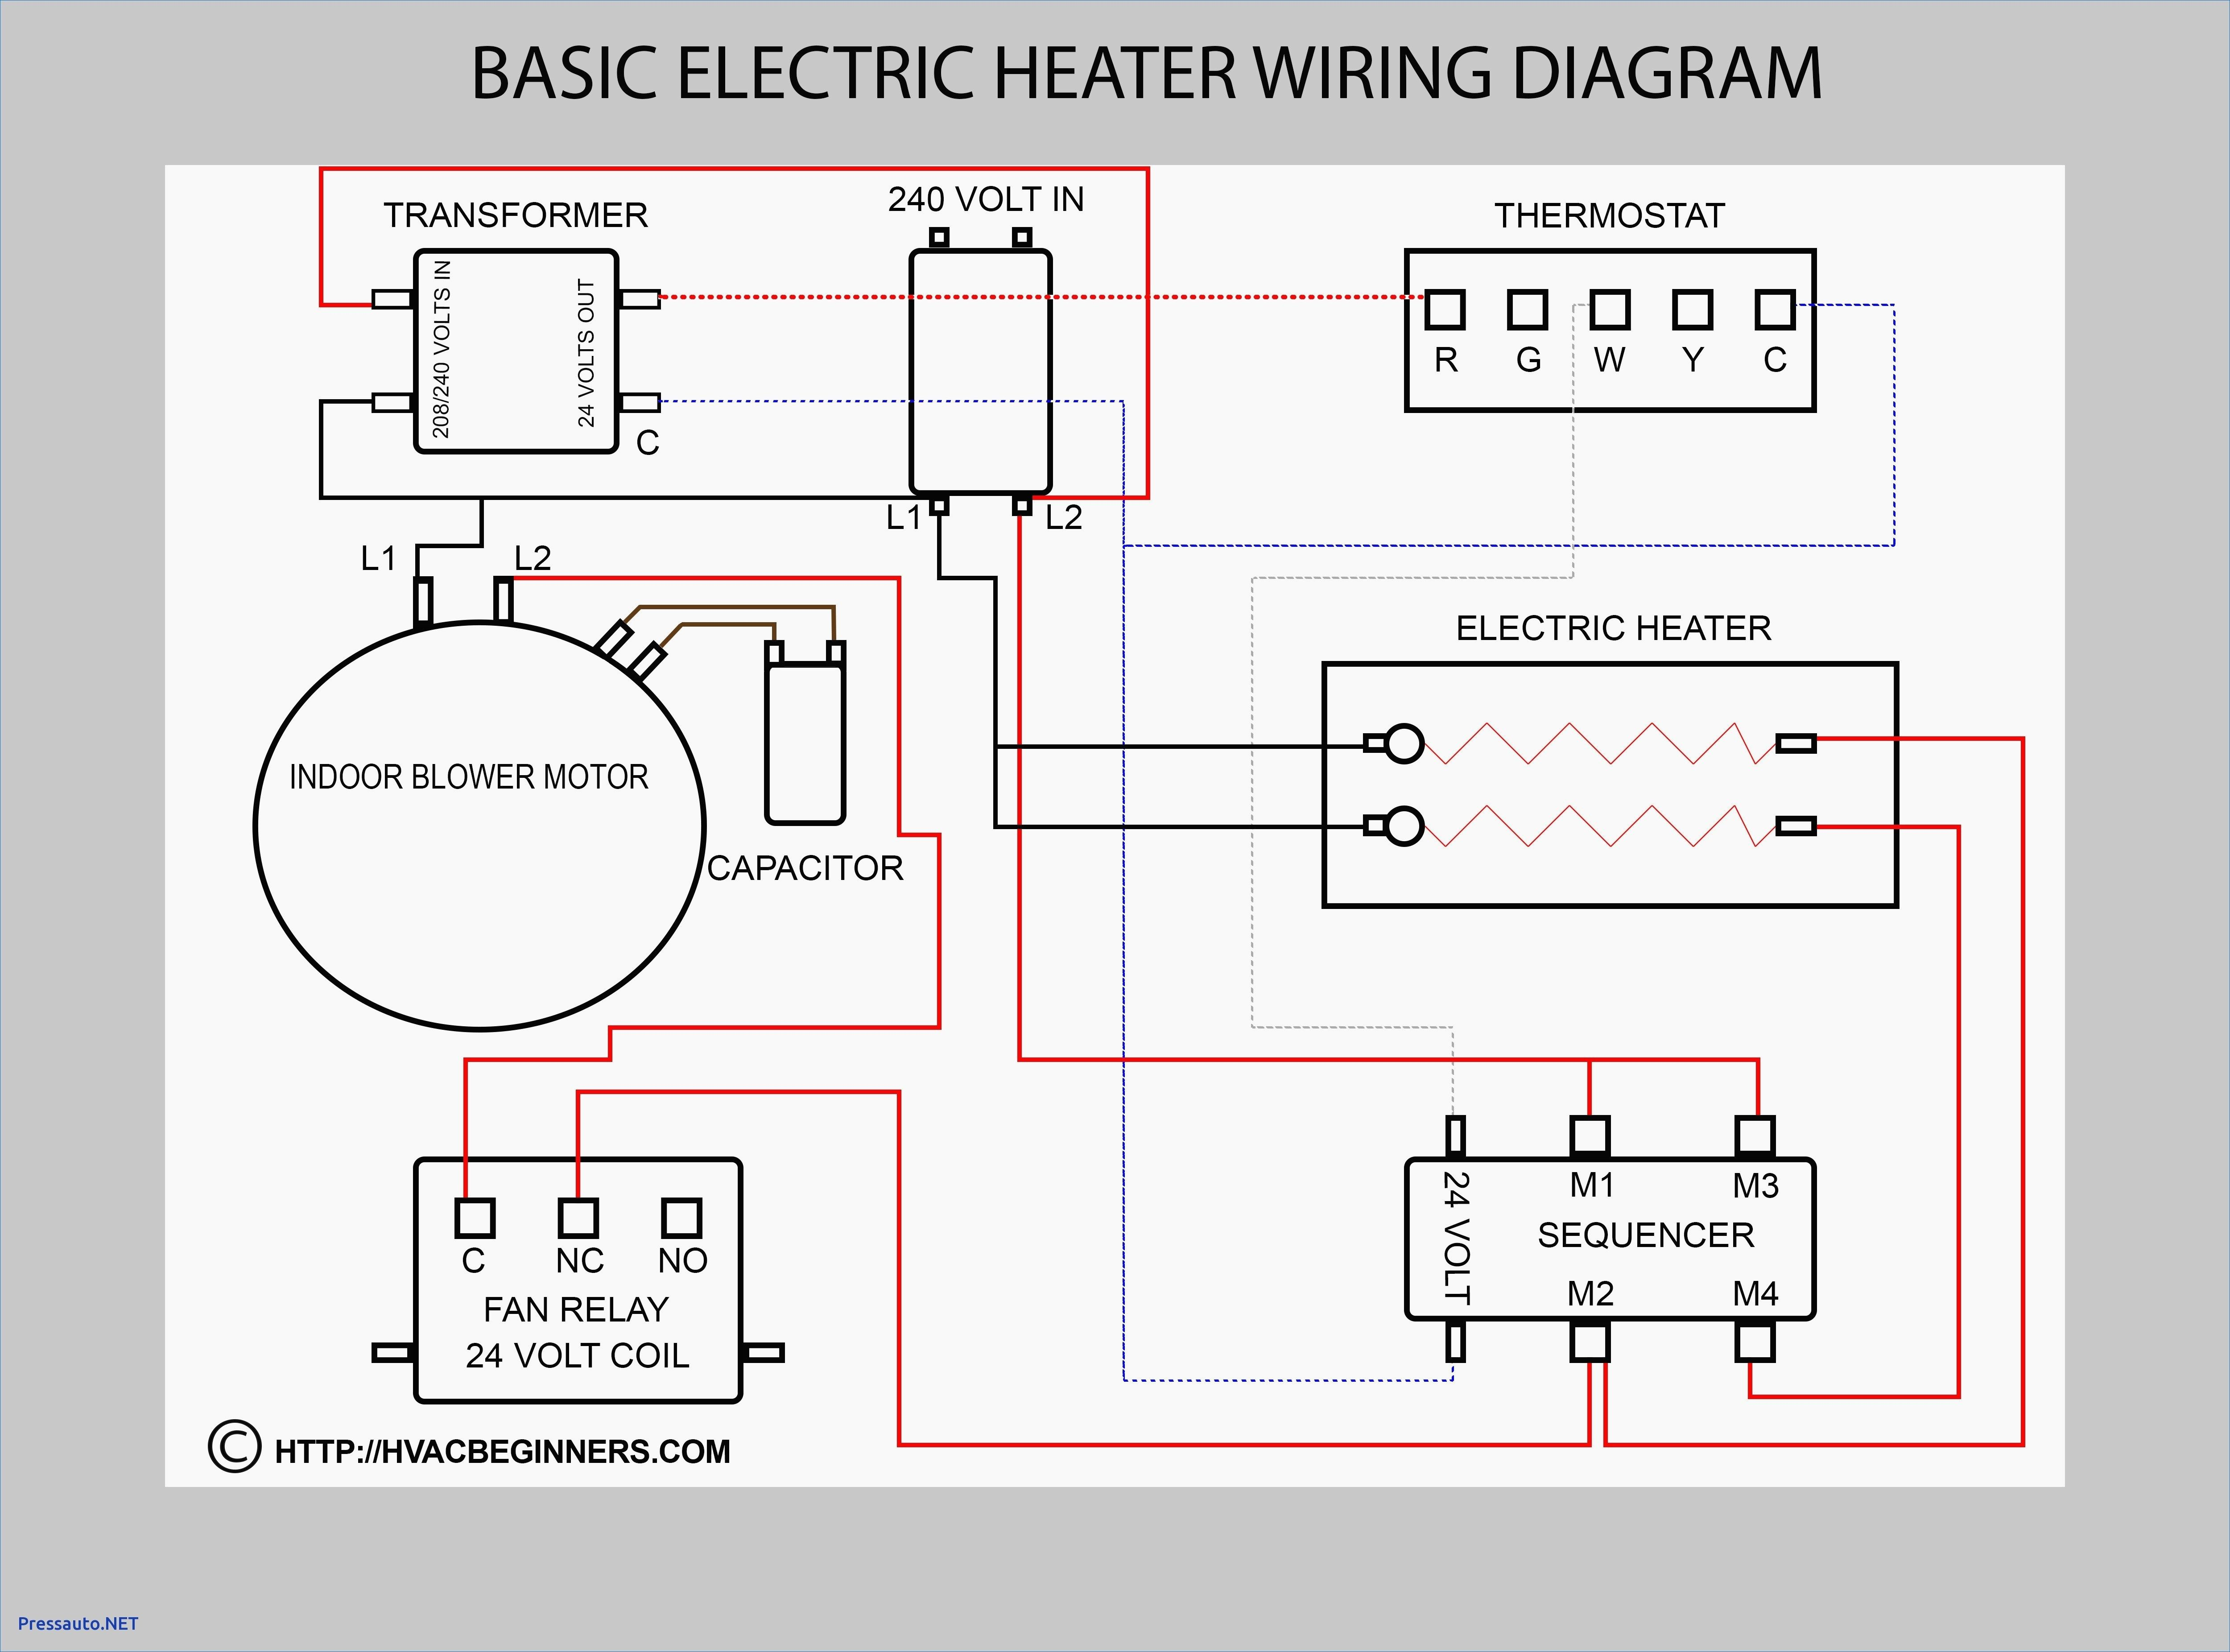 wiring diagram 220 volt campbell hausfeld wiring diagram meta 220 volt air compressor wiring diagram 240 volt air compressor wiring diagram [ 5000 x 3704 Pixel ]